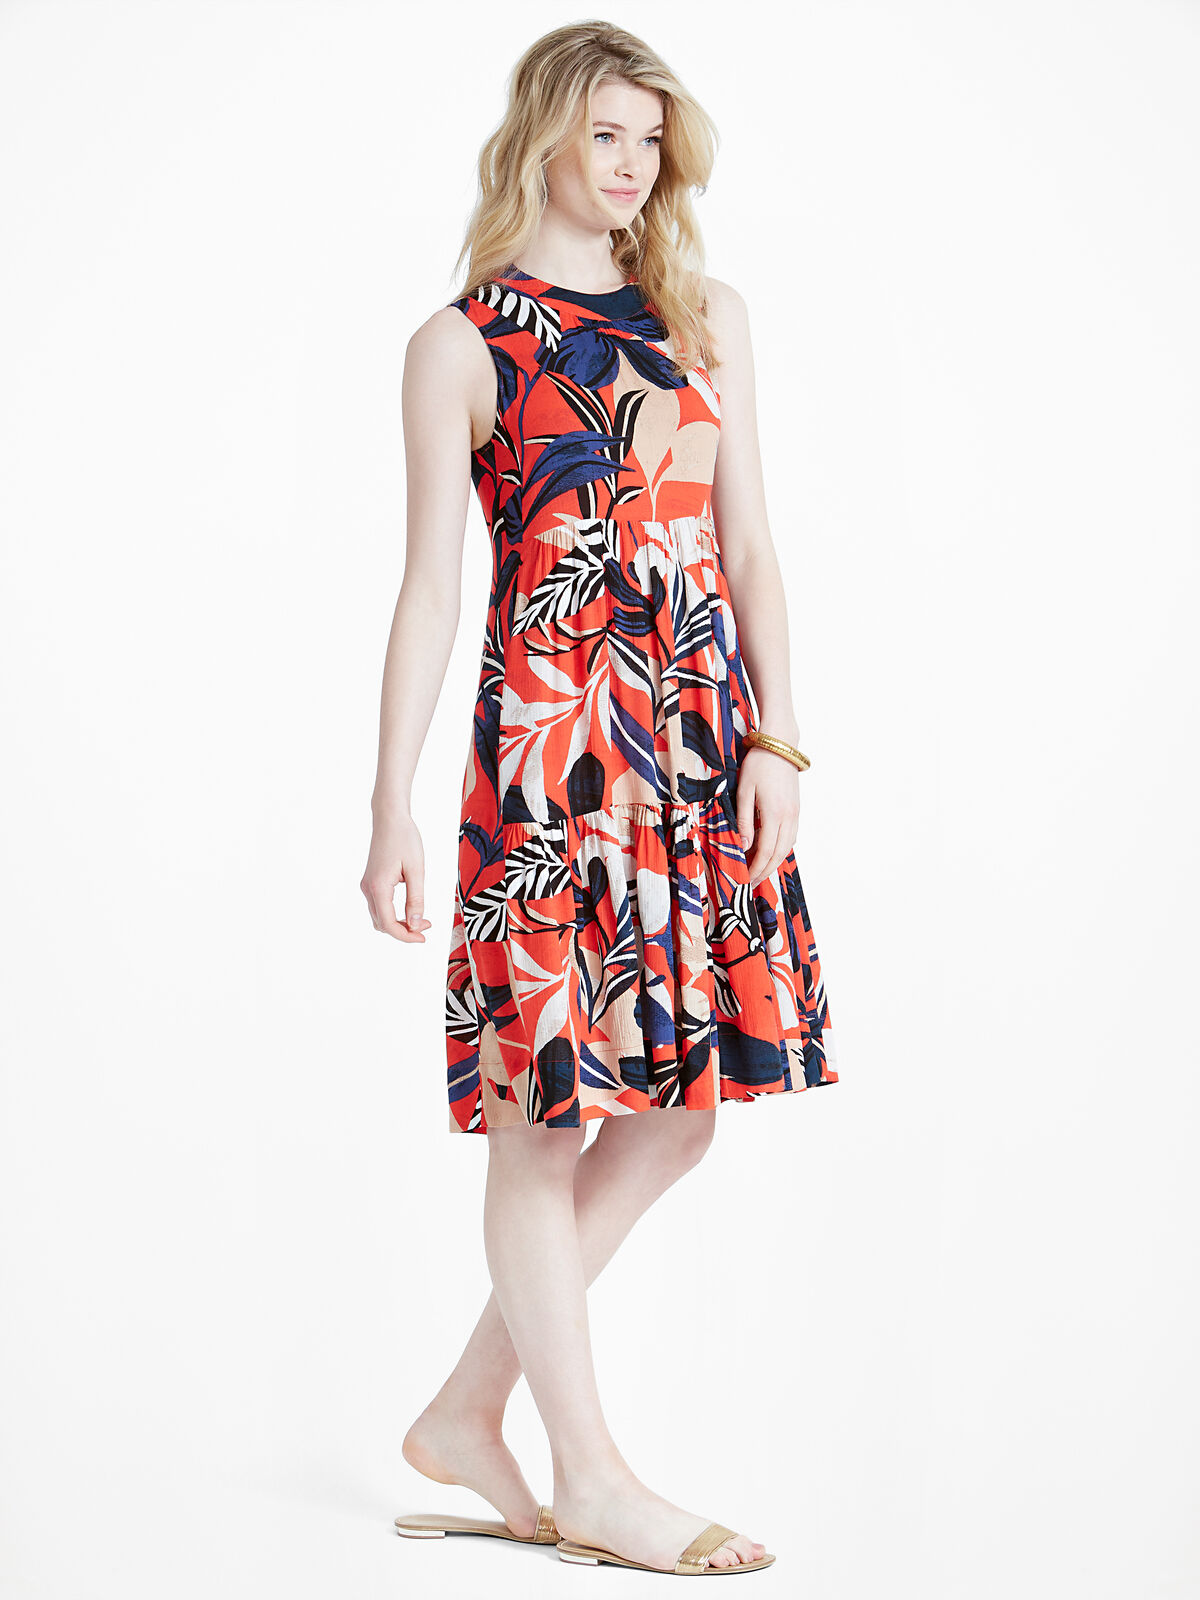 Tahiti Tier Dress